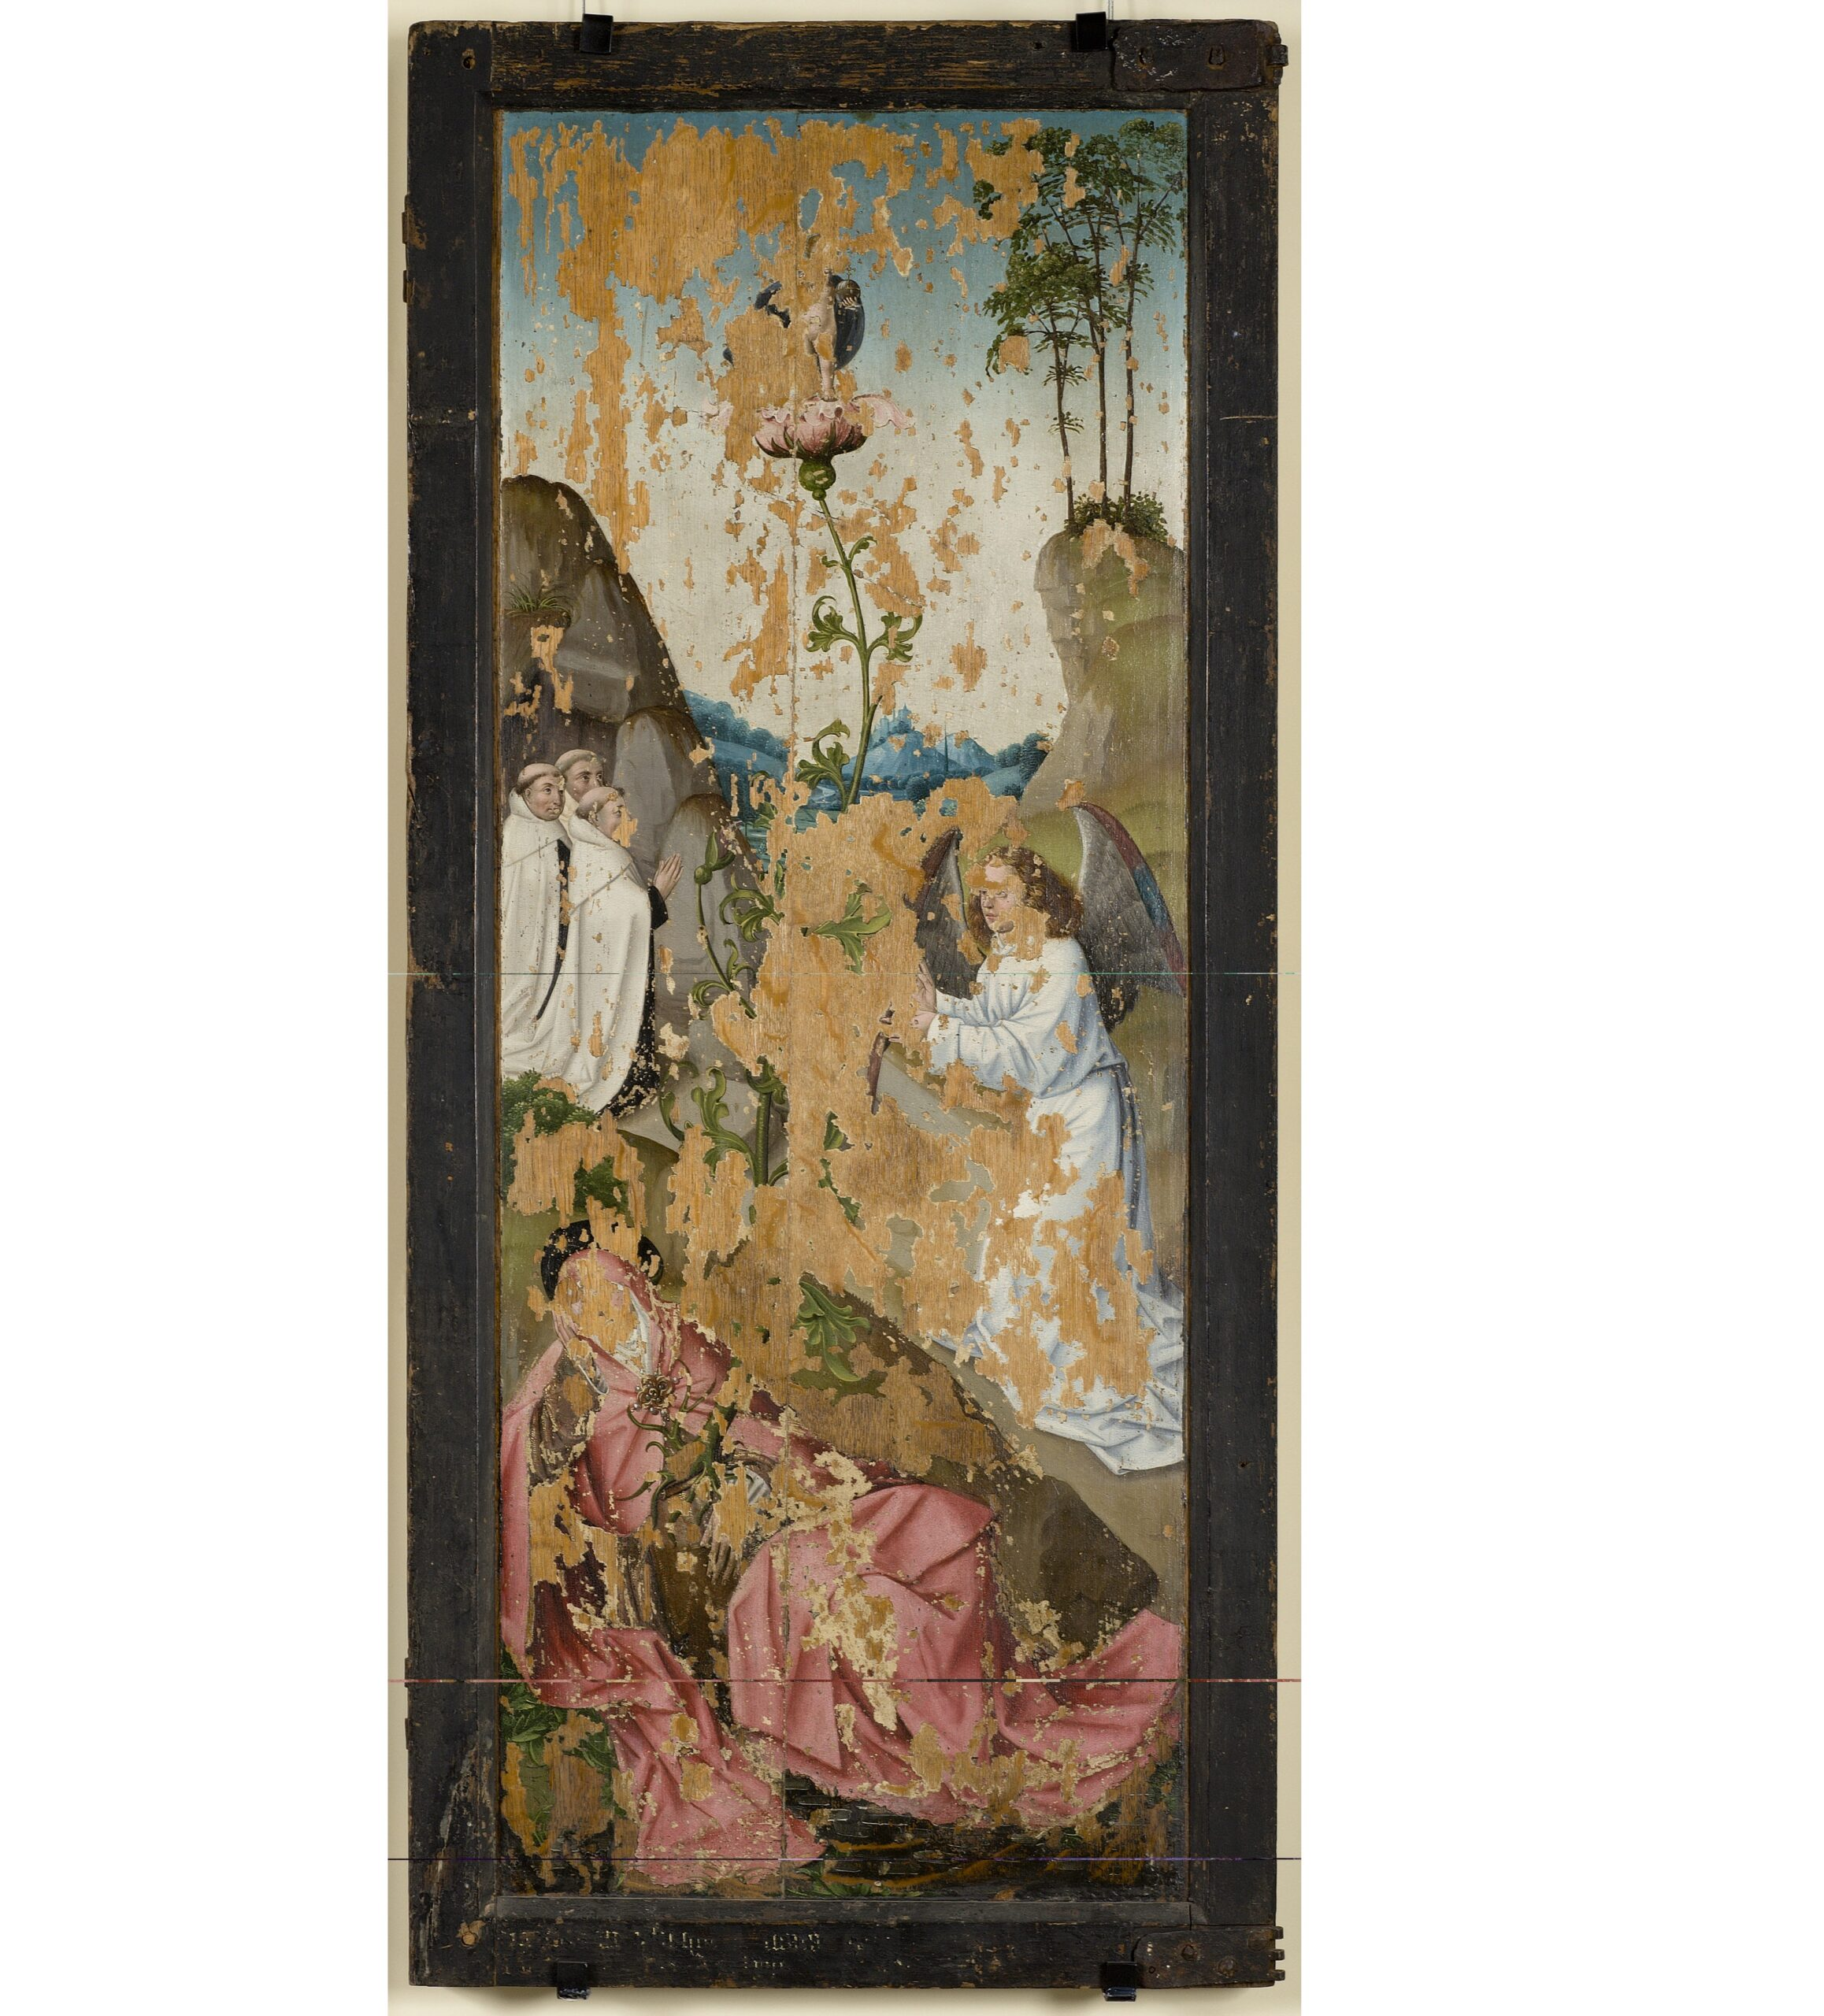 Brussels workshop, The Holy Kinship Altarpiece (Emerentia's Vision on Mount Carmel), ca. 1500 Art Museum of Estonia